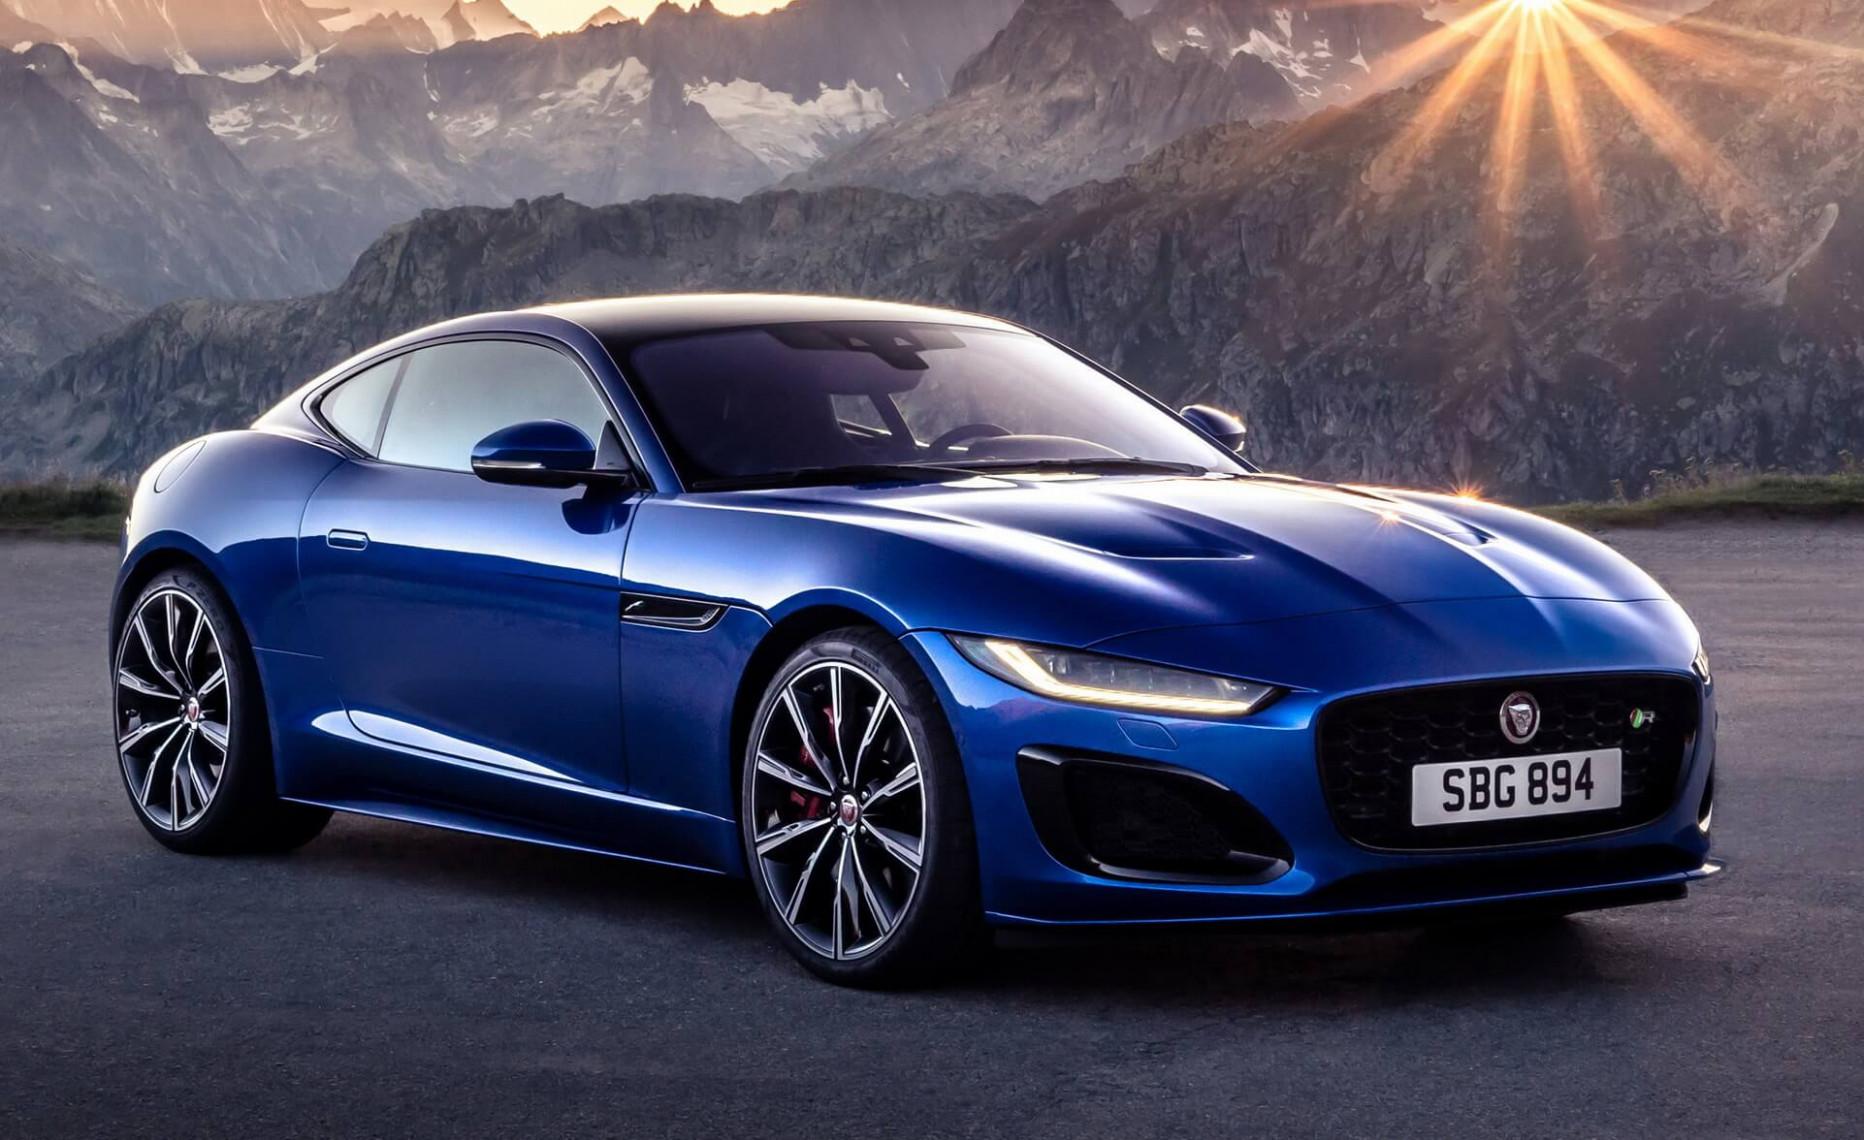 Exterior and Interior 2022 Jaguar F-Type